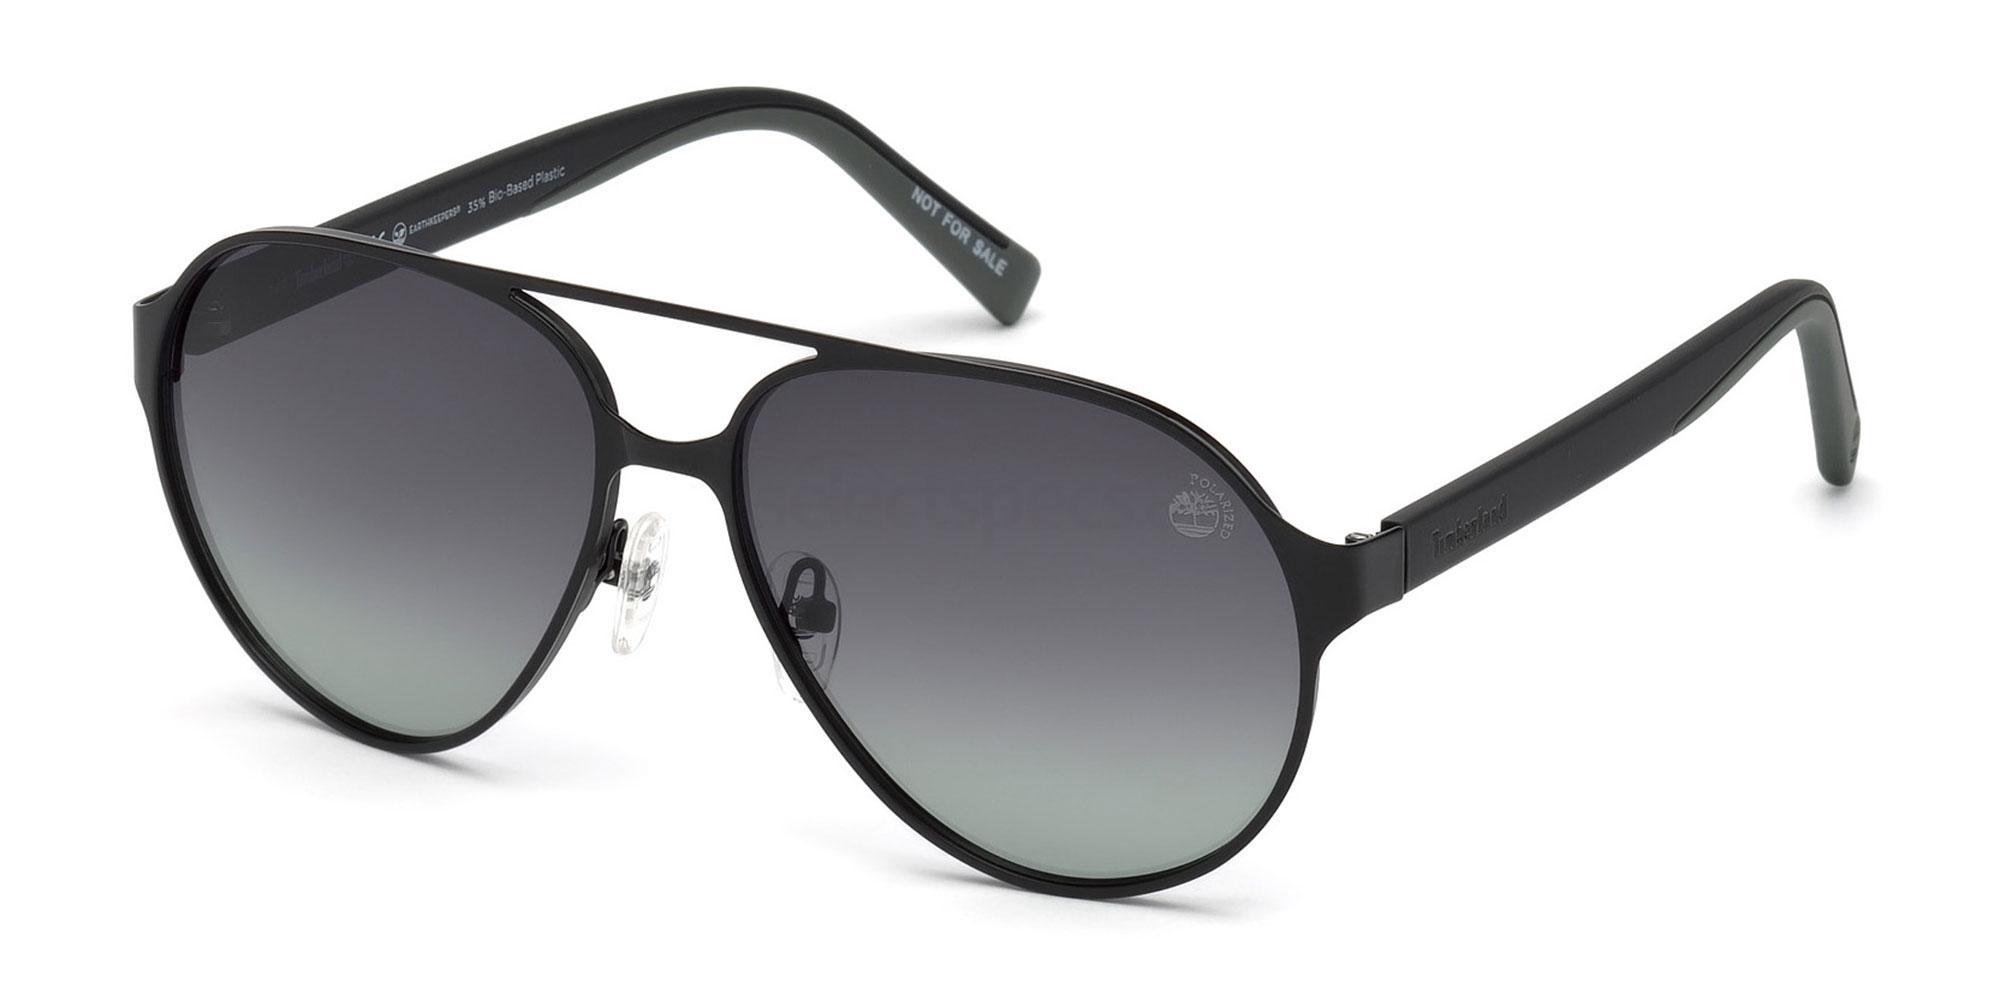 02D TB9145 Sunglasses, Timberland